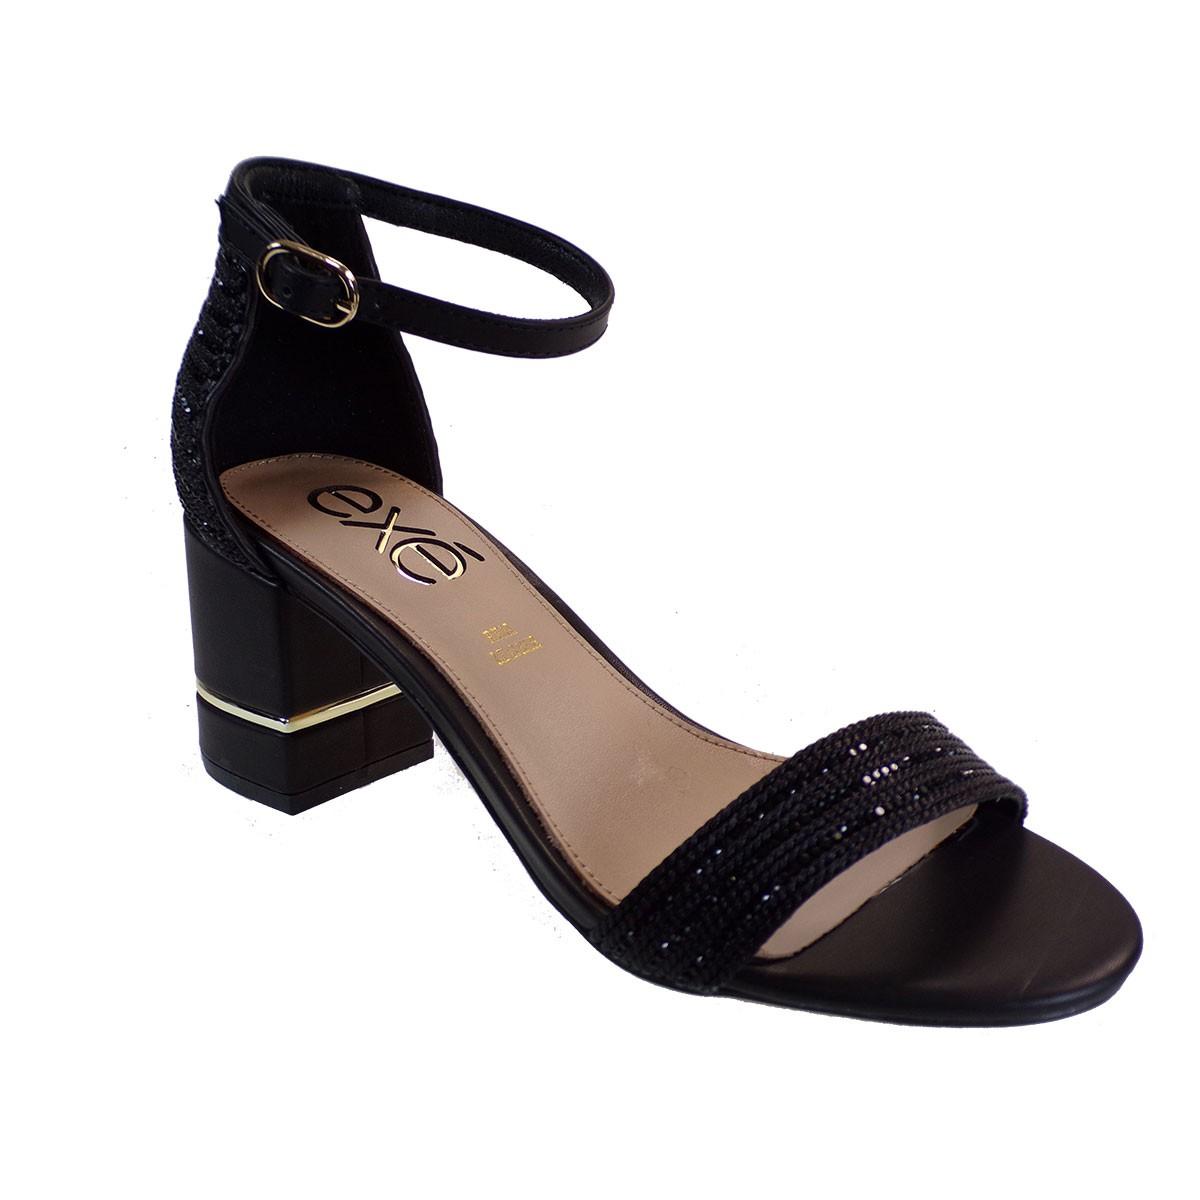 EXE Shoes Πέδιλα Γυναικεία 631-PENNY-361 Μαύρο Στράς Μακραμε M47006314P20